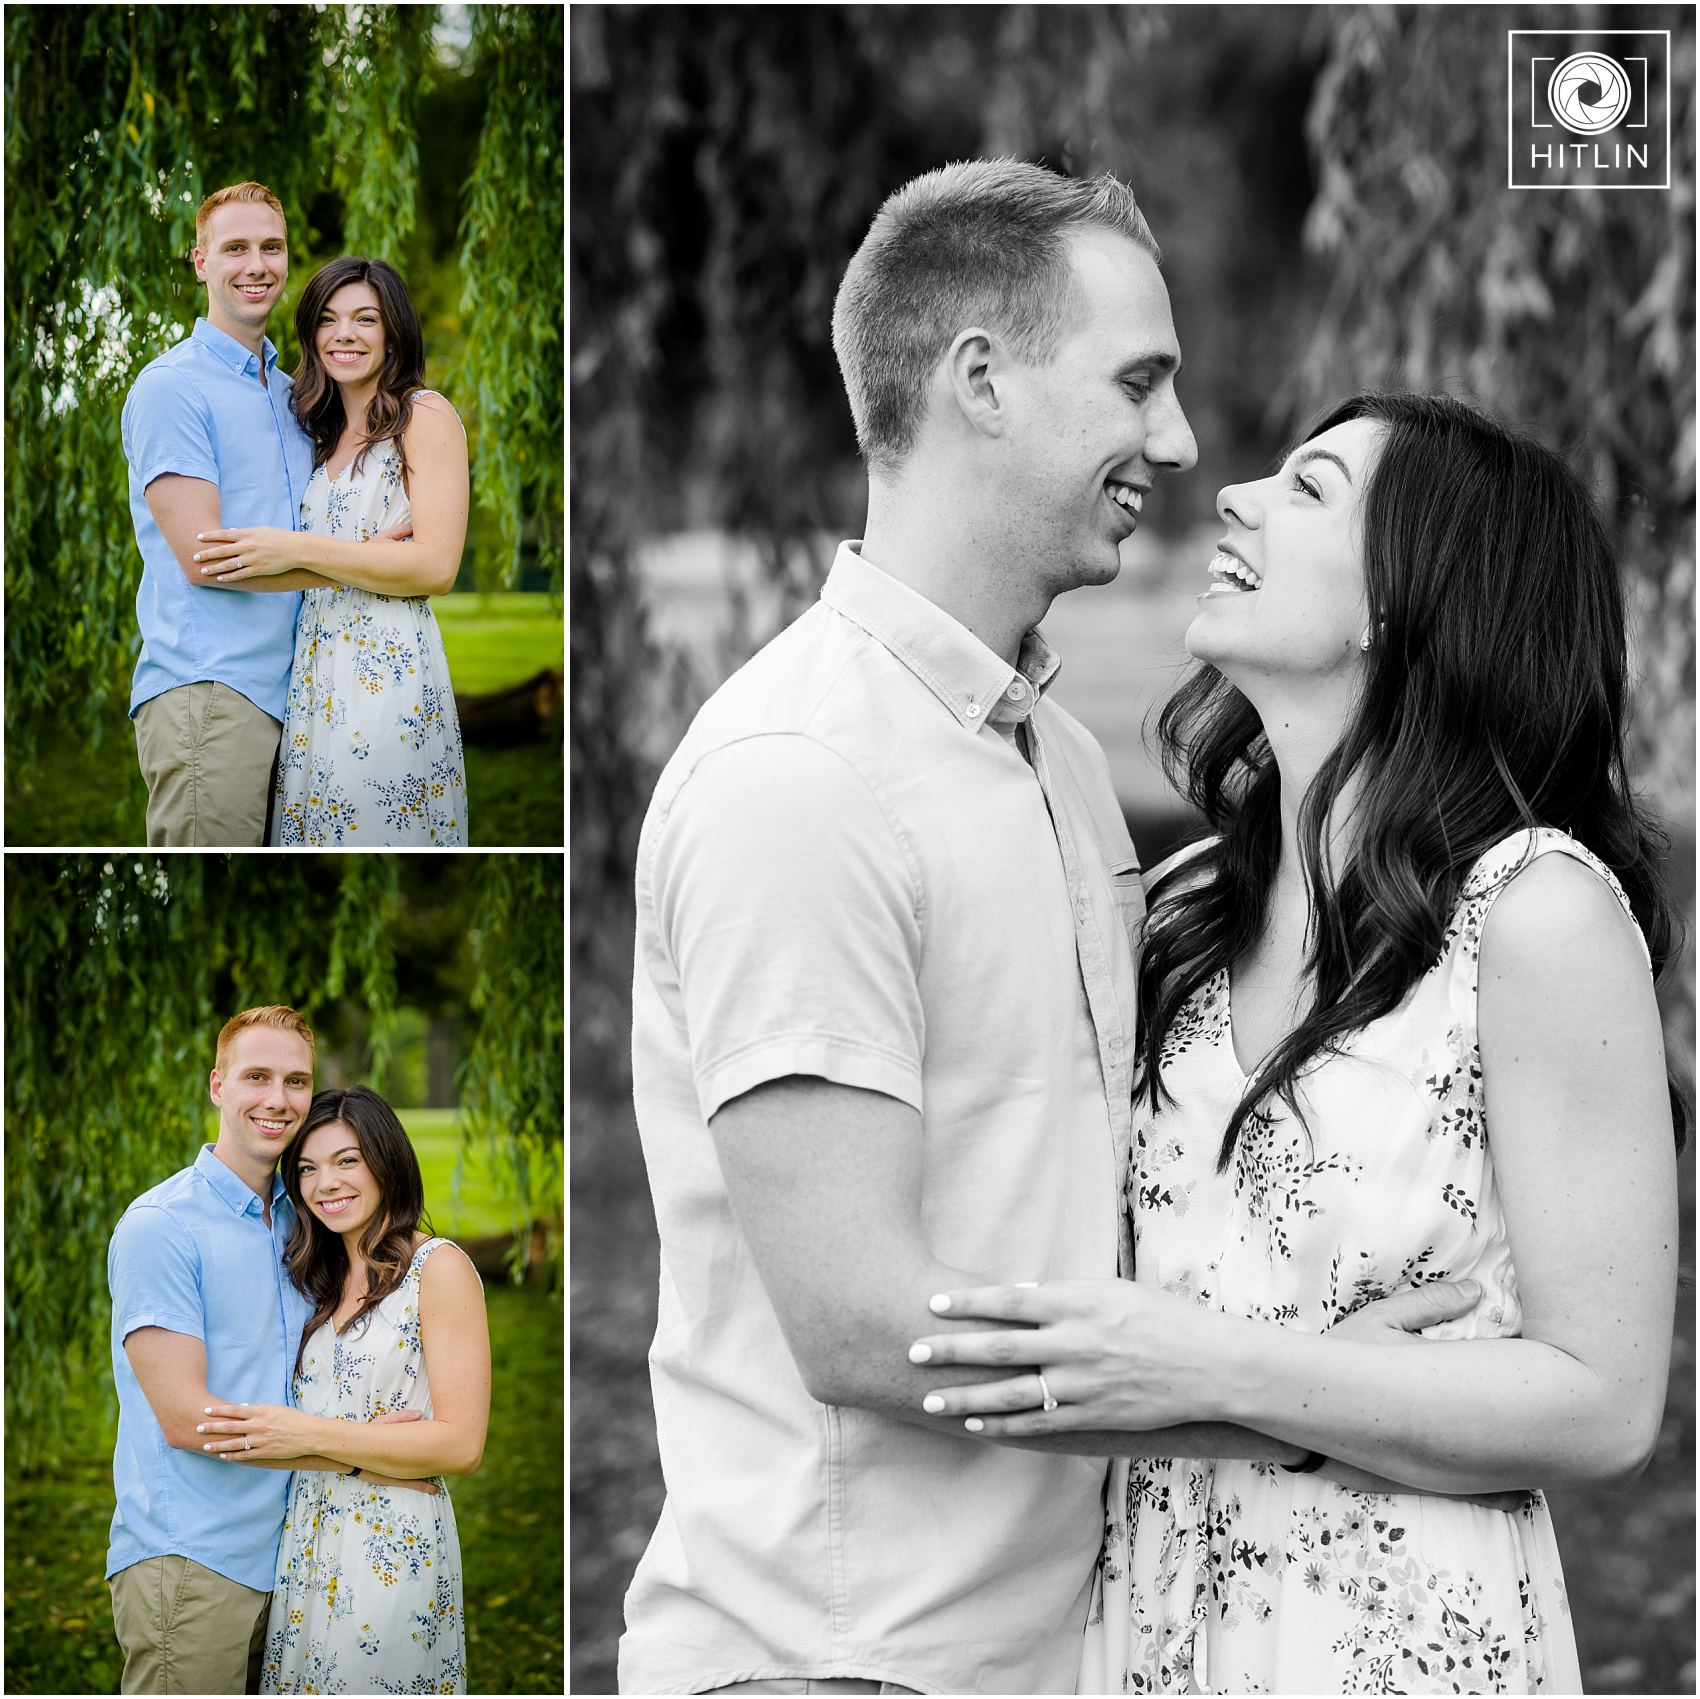 Jennifer & Mark's Engagement Session